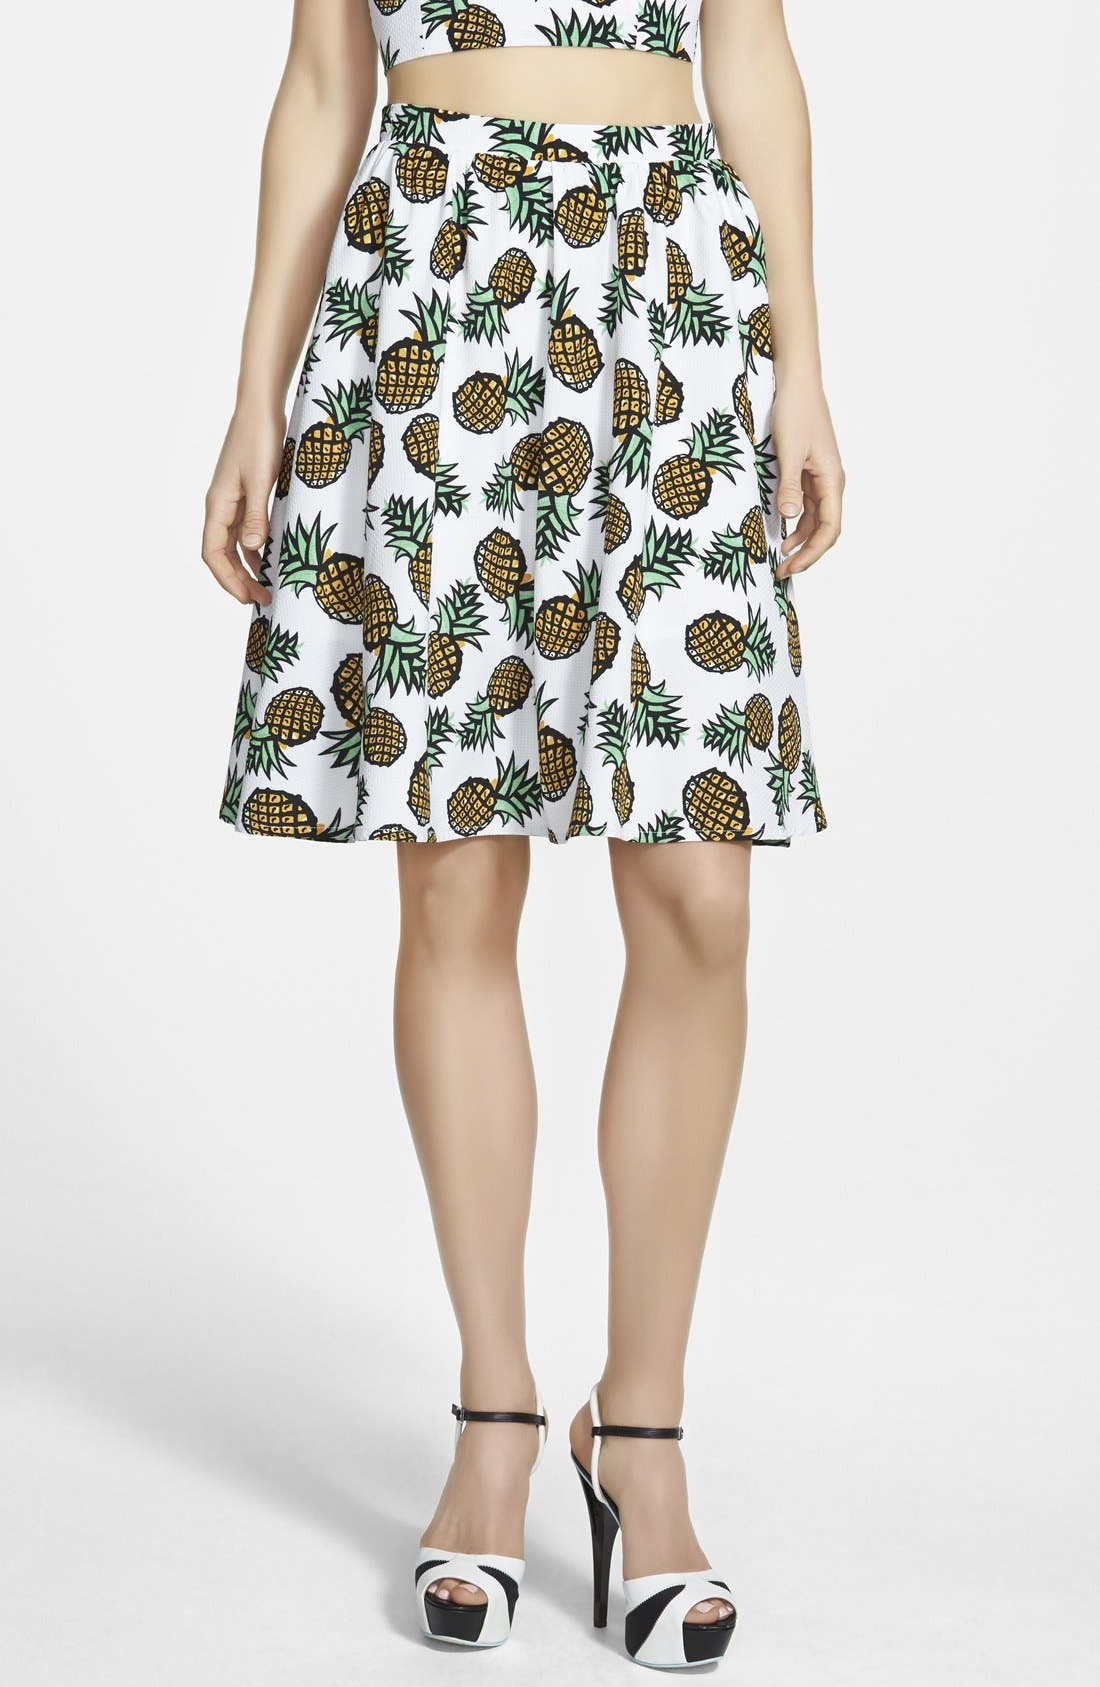 Main Image - Piece Goods Pineapple Skirt